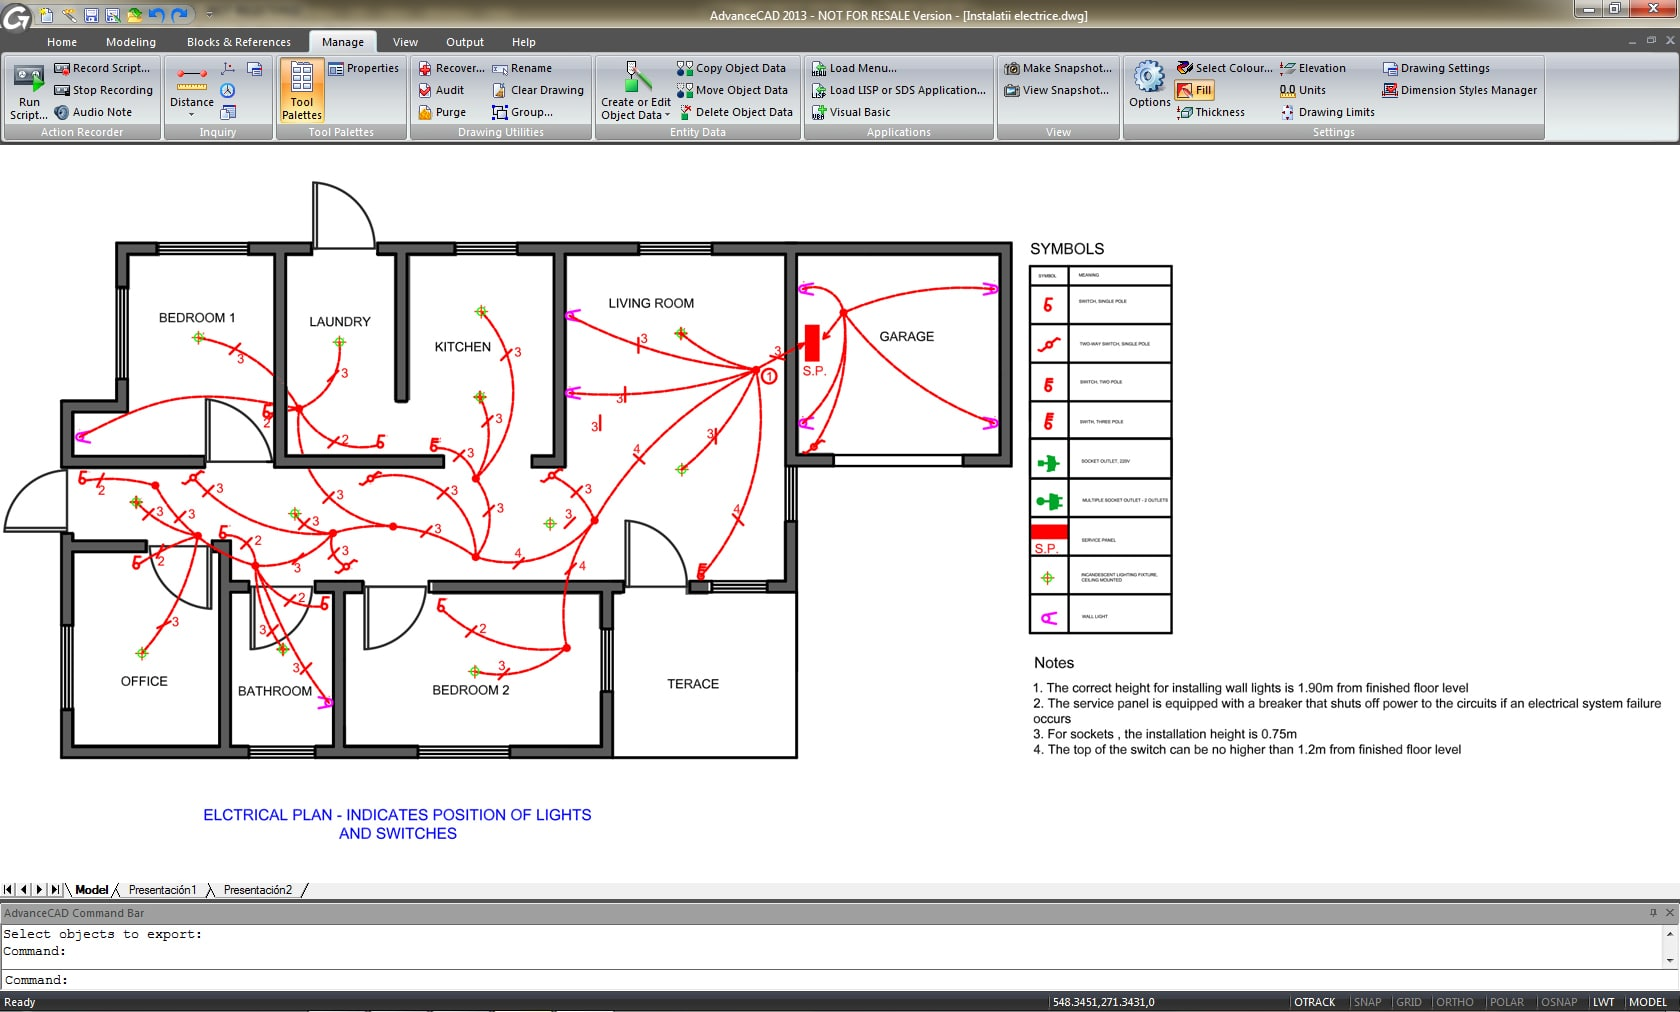 GRAITEC Advance CAD | Interoperability